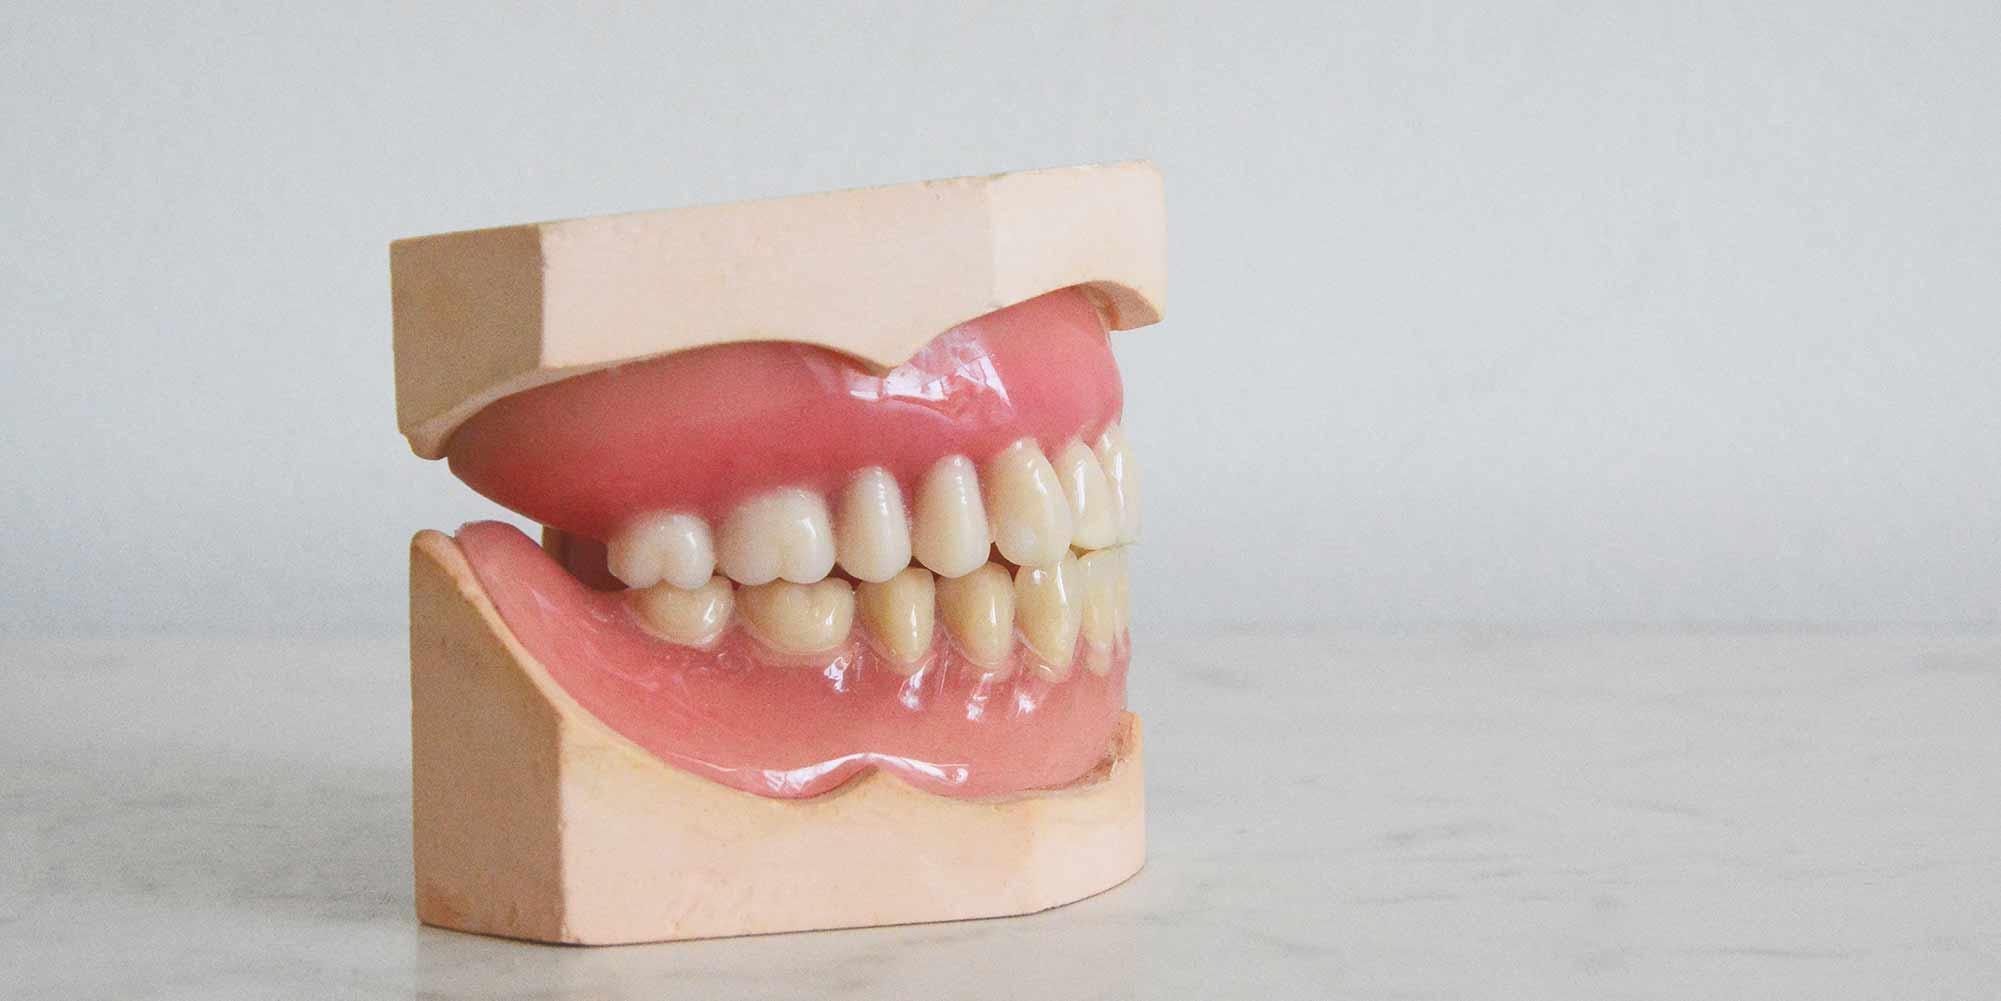 Zahnarzt Praxis Neubrunn